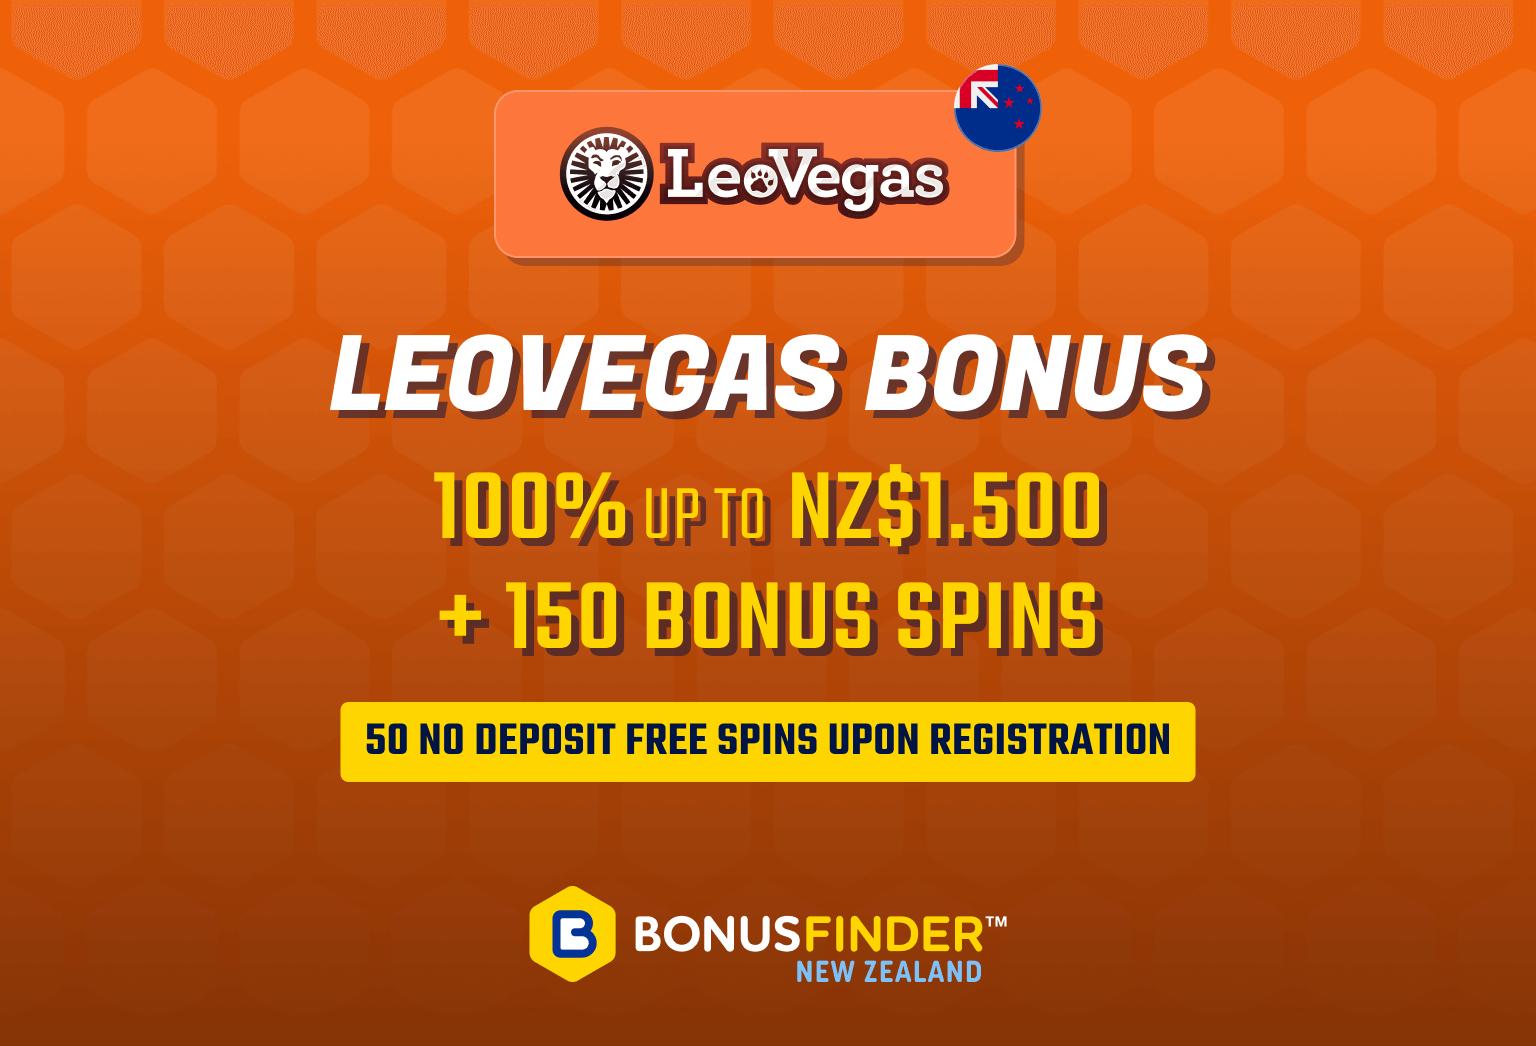 Leovegas bonus